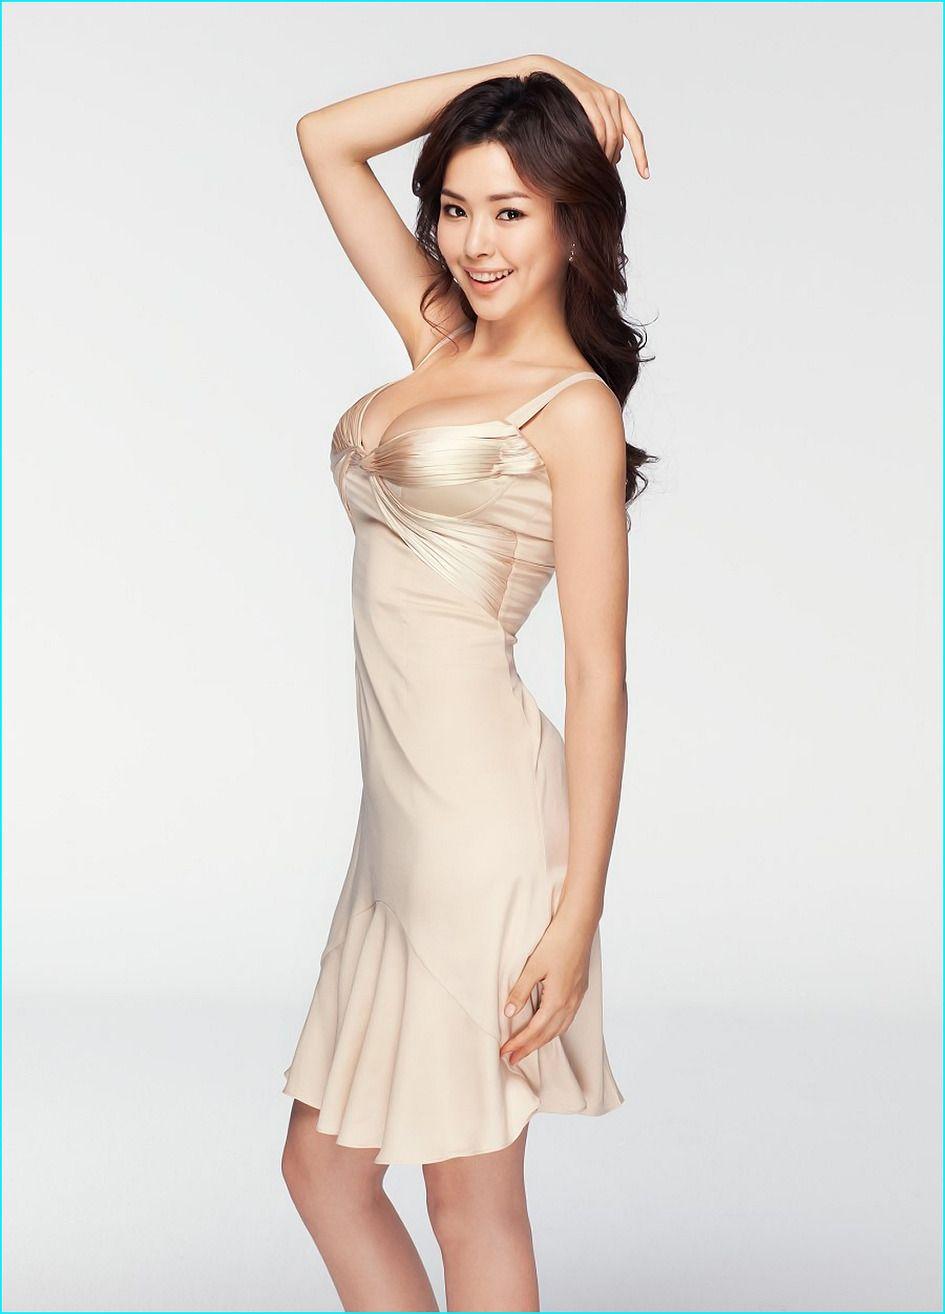 Lee Ha-Nui 이하늬 비너스 화보(3P) | Actress Lee Ha-Nui